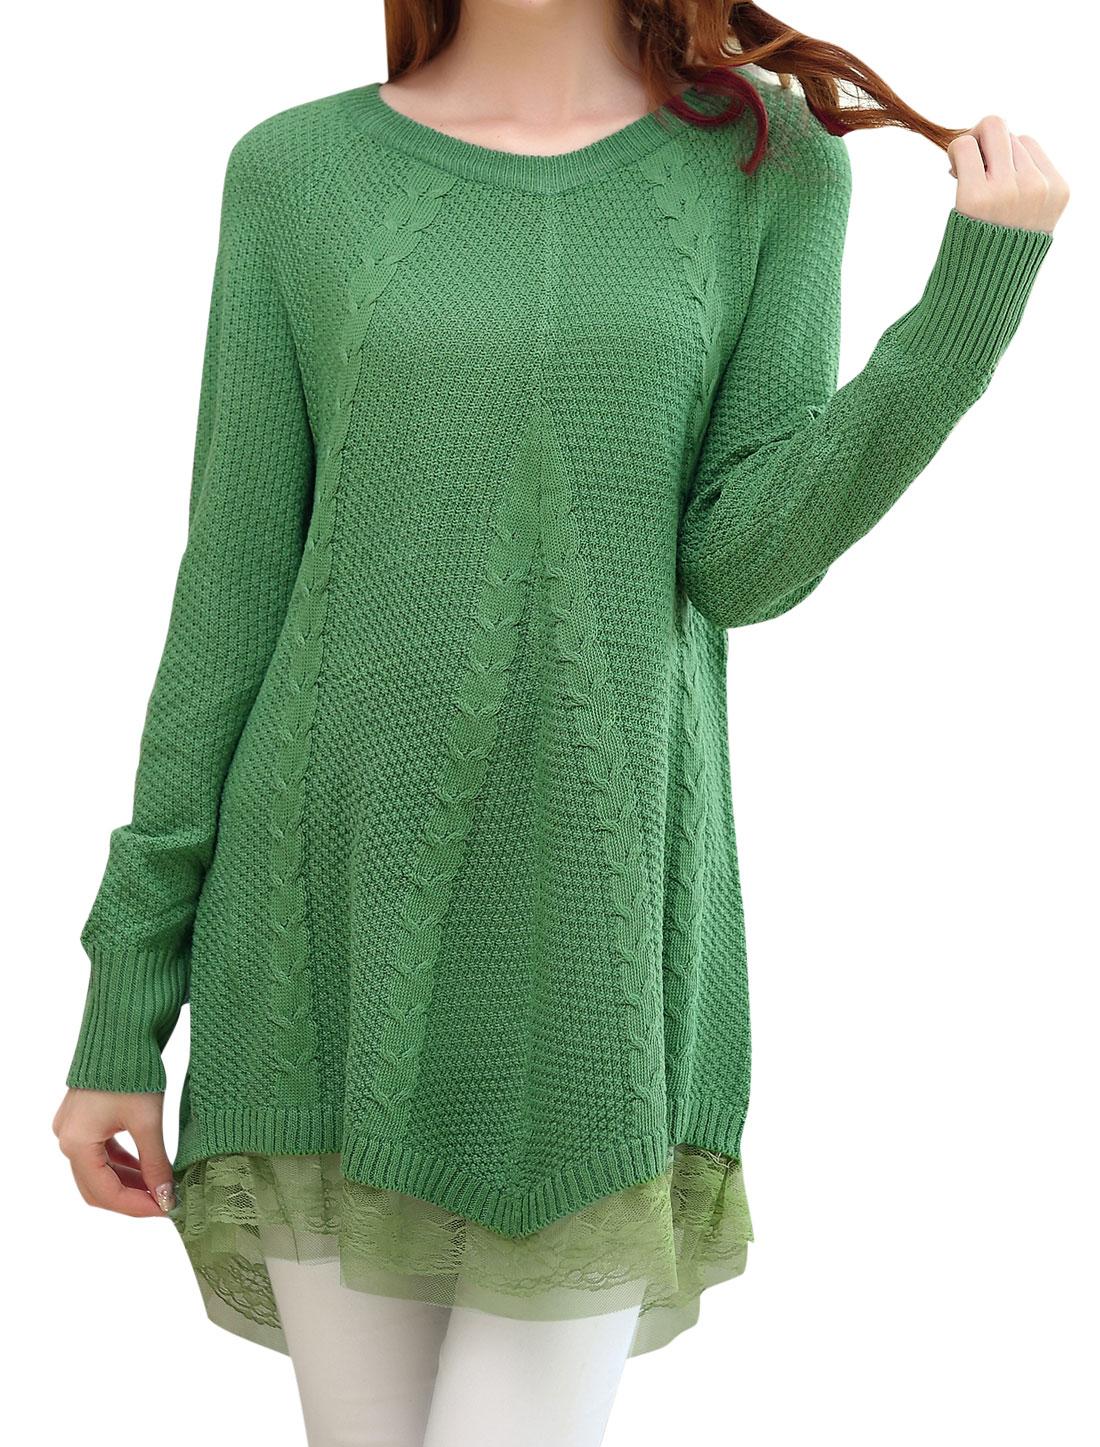 Maternity Round Neck Raglan Sleeve Lace Patchwork Hem Tunic Sweater Light Green M